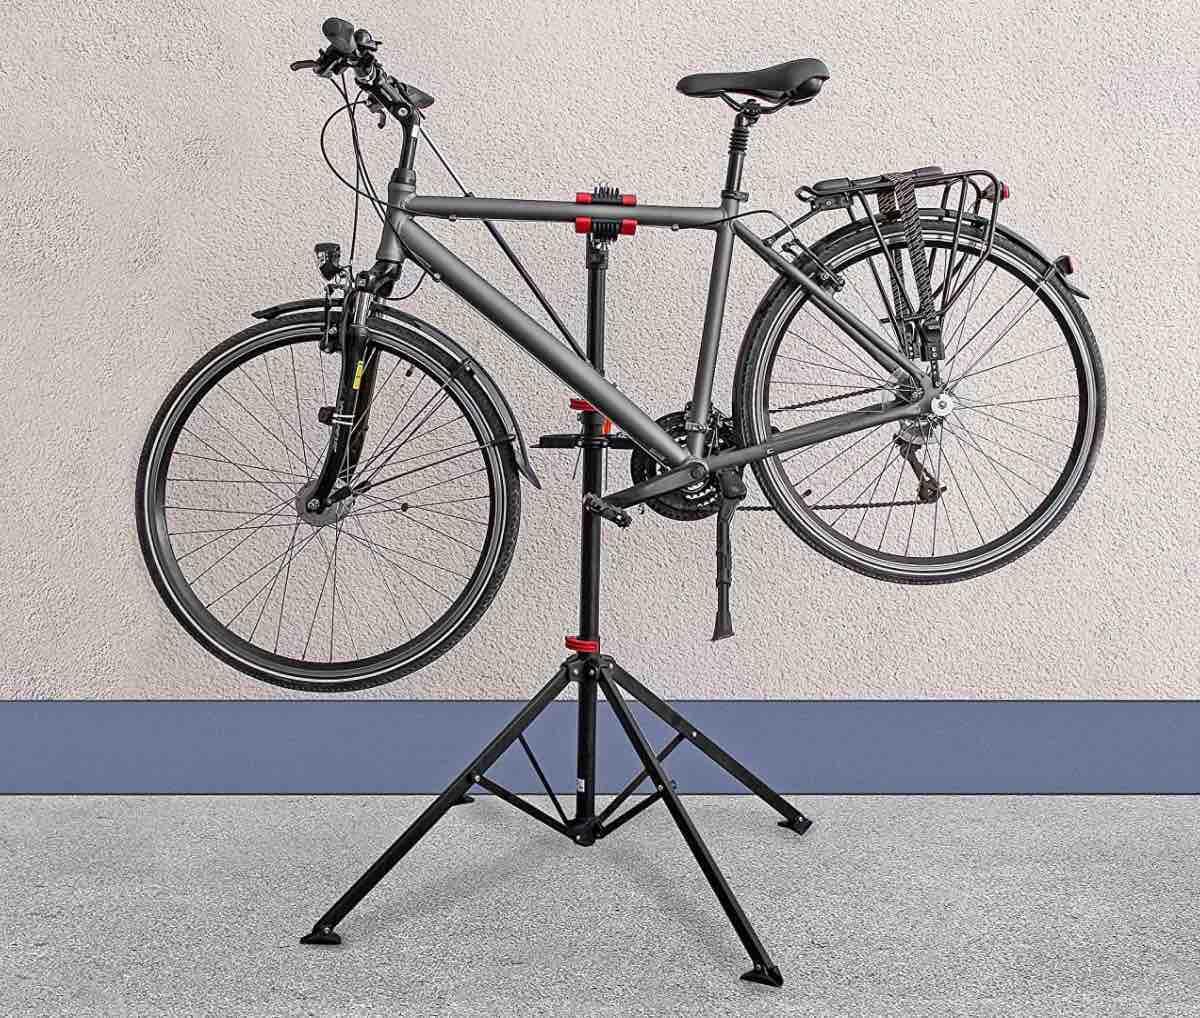 Fahrrad Reparatur Werkzeug